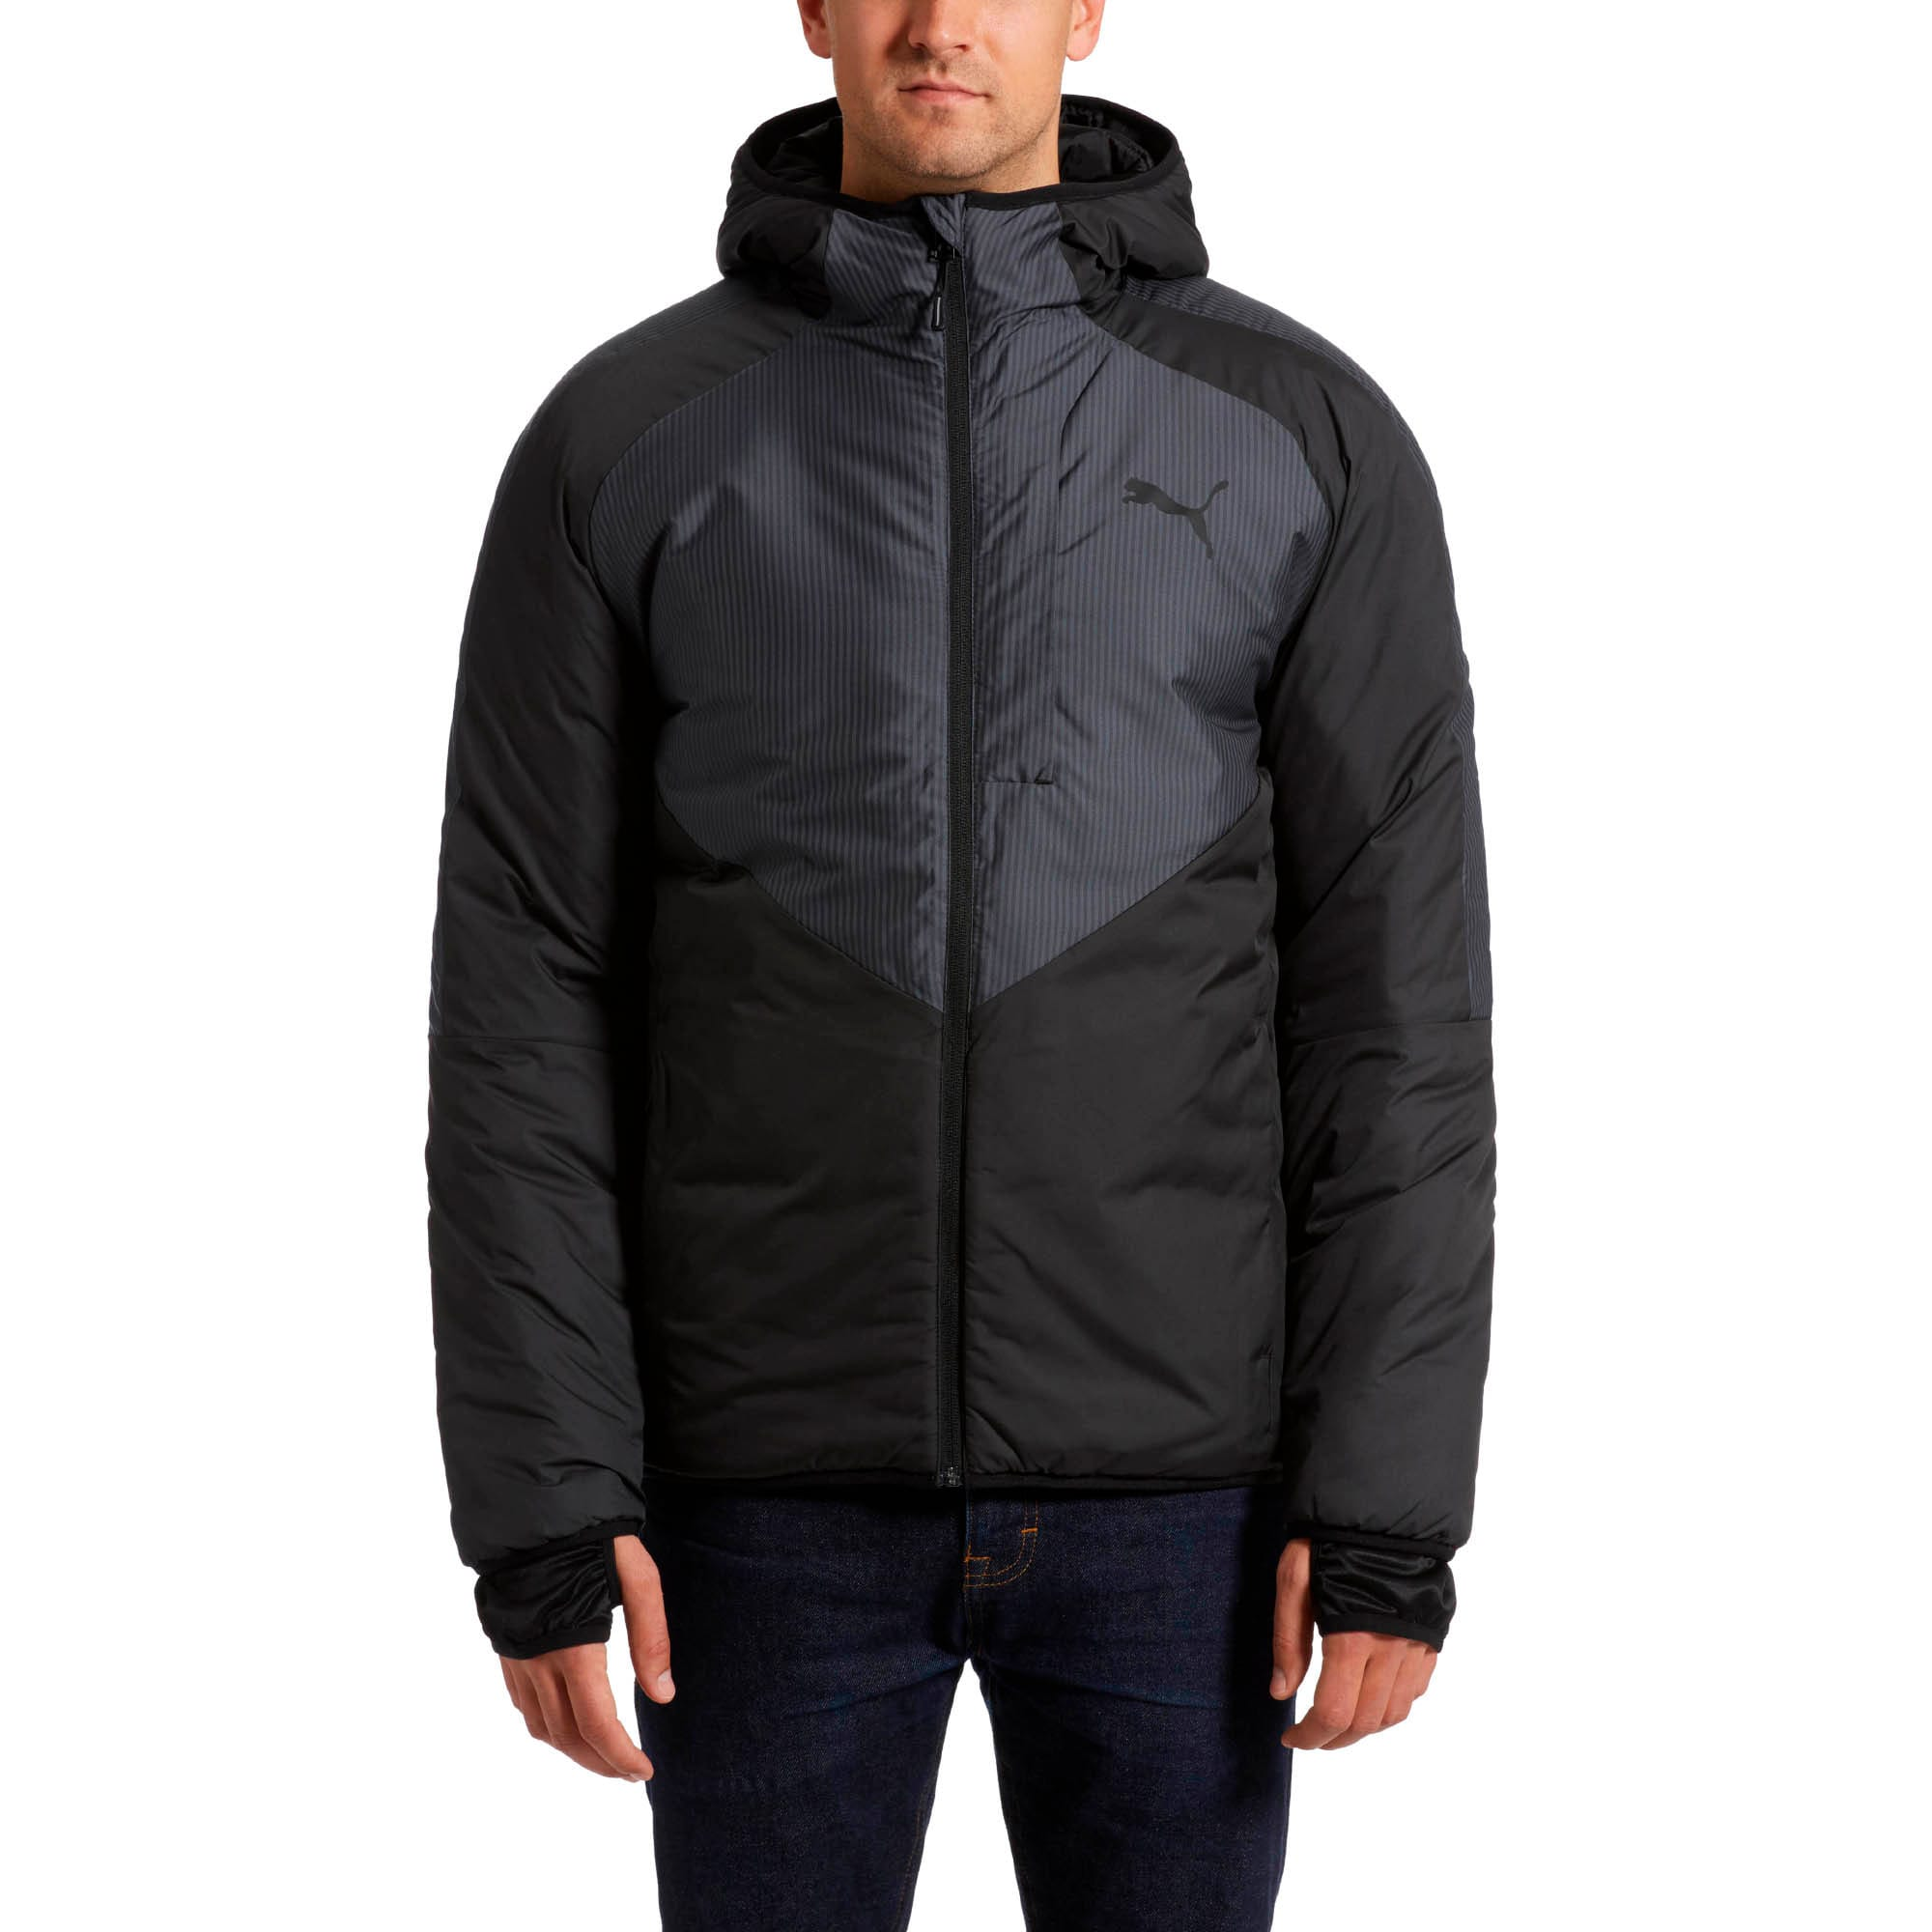 Thumbnail 2 of PWRWarm Men's Jacket, Puma Black, medium